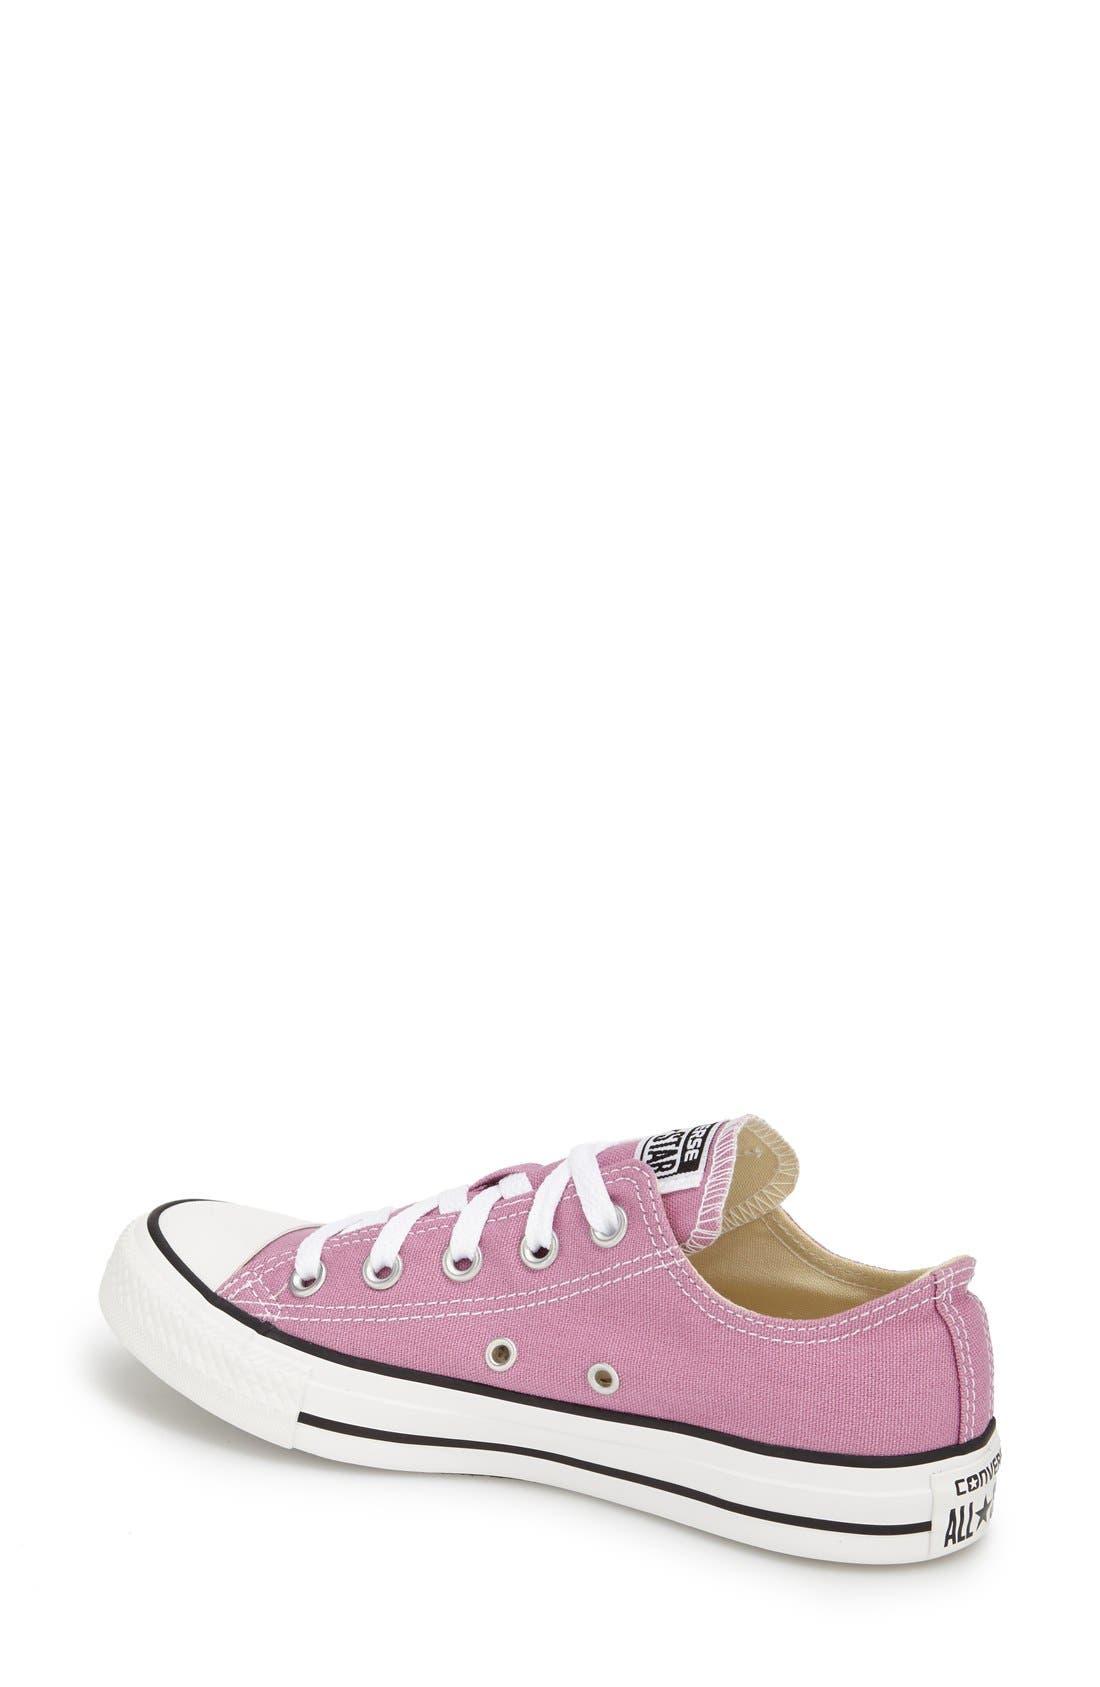 Alternate Image 2  - Converse Chuck Taylor® All Star® 'Ox' Low Top Sneaker (Women)